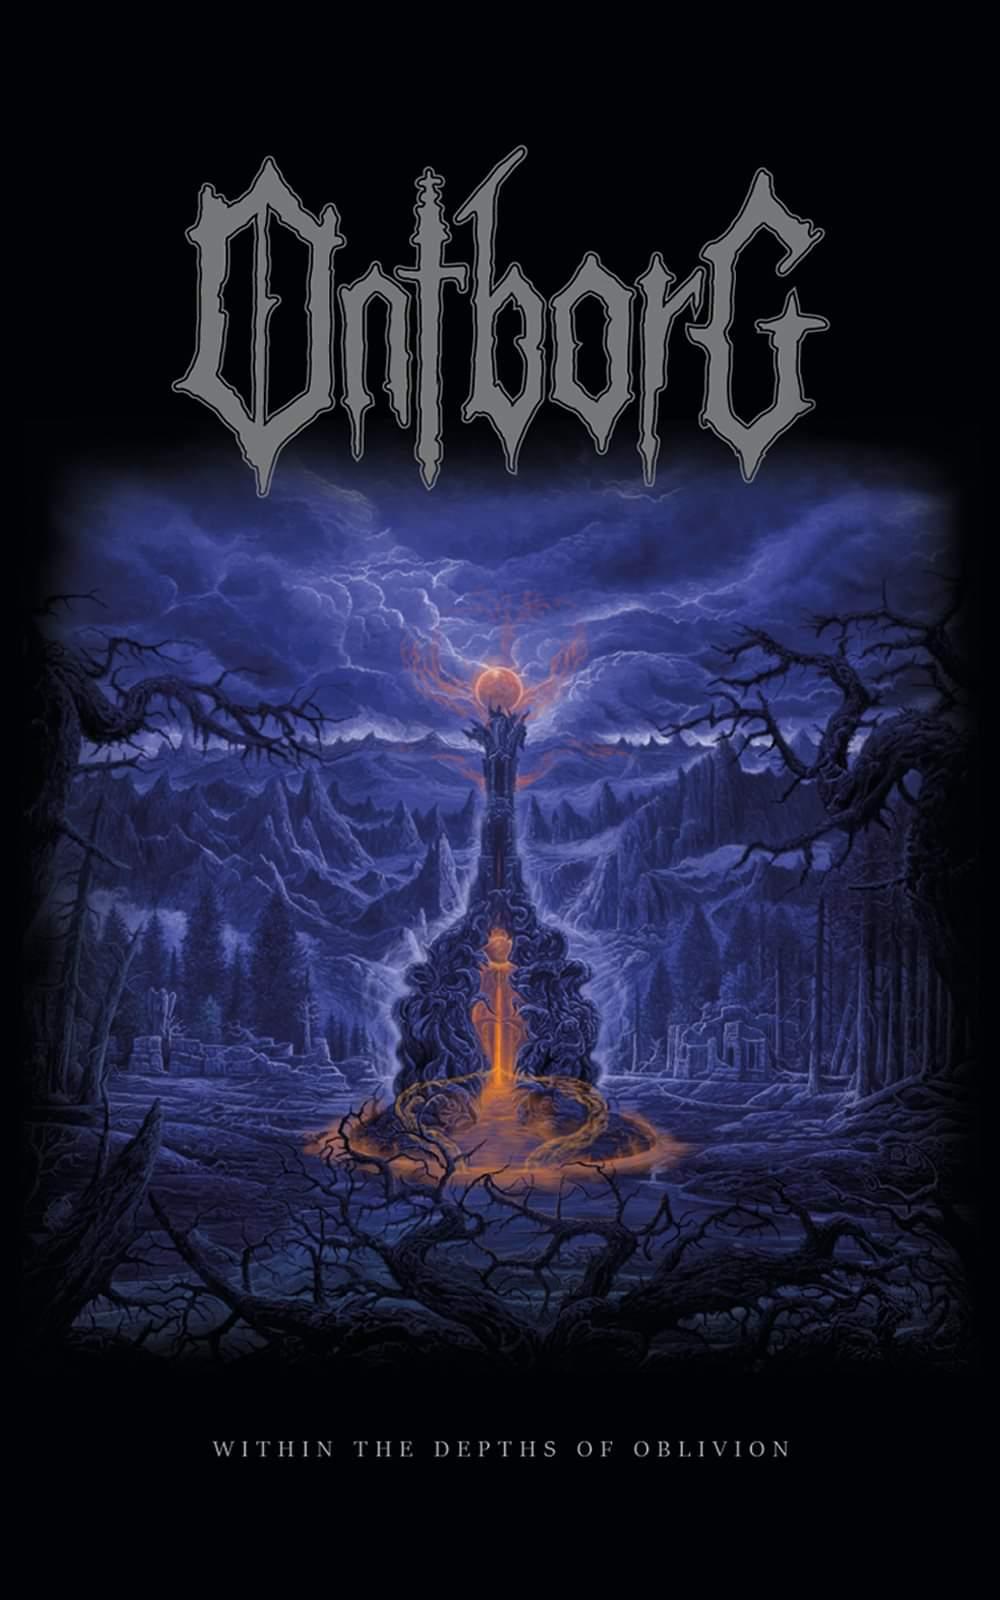 ontborg-within-the-depths-of-oblivion-ein-album-review